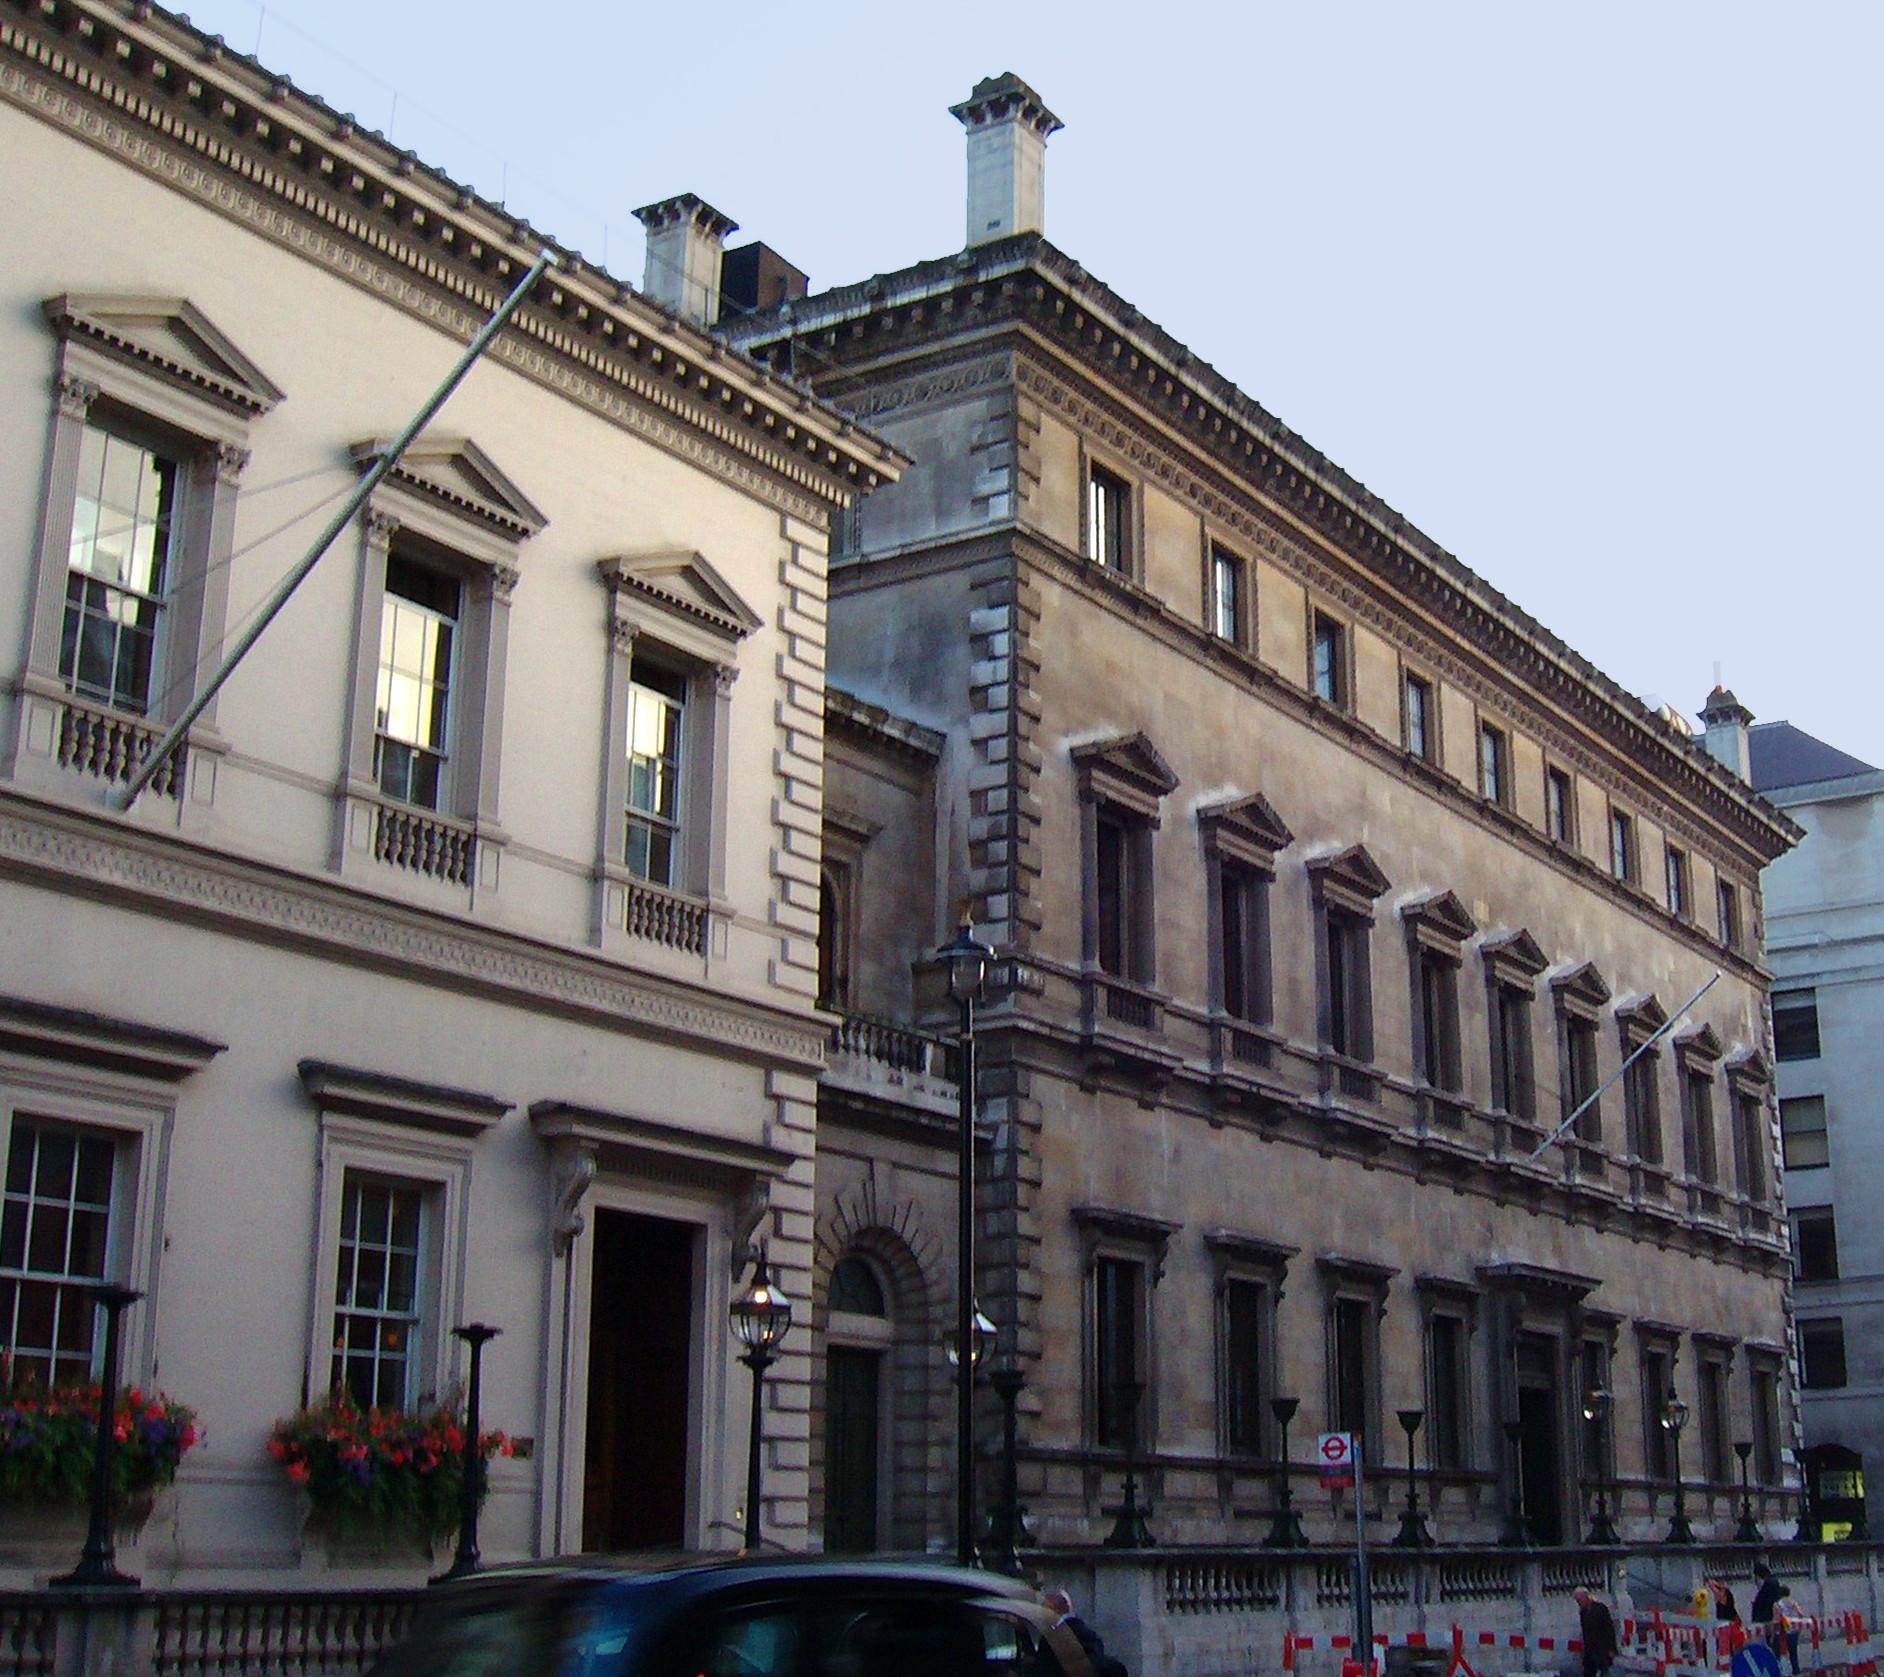 Renaissasnce Buildings London